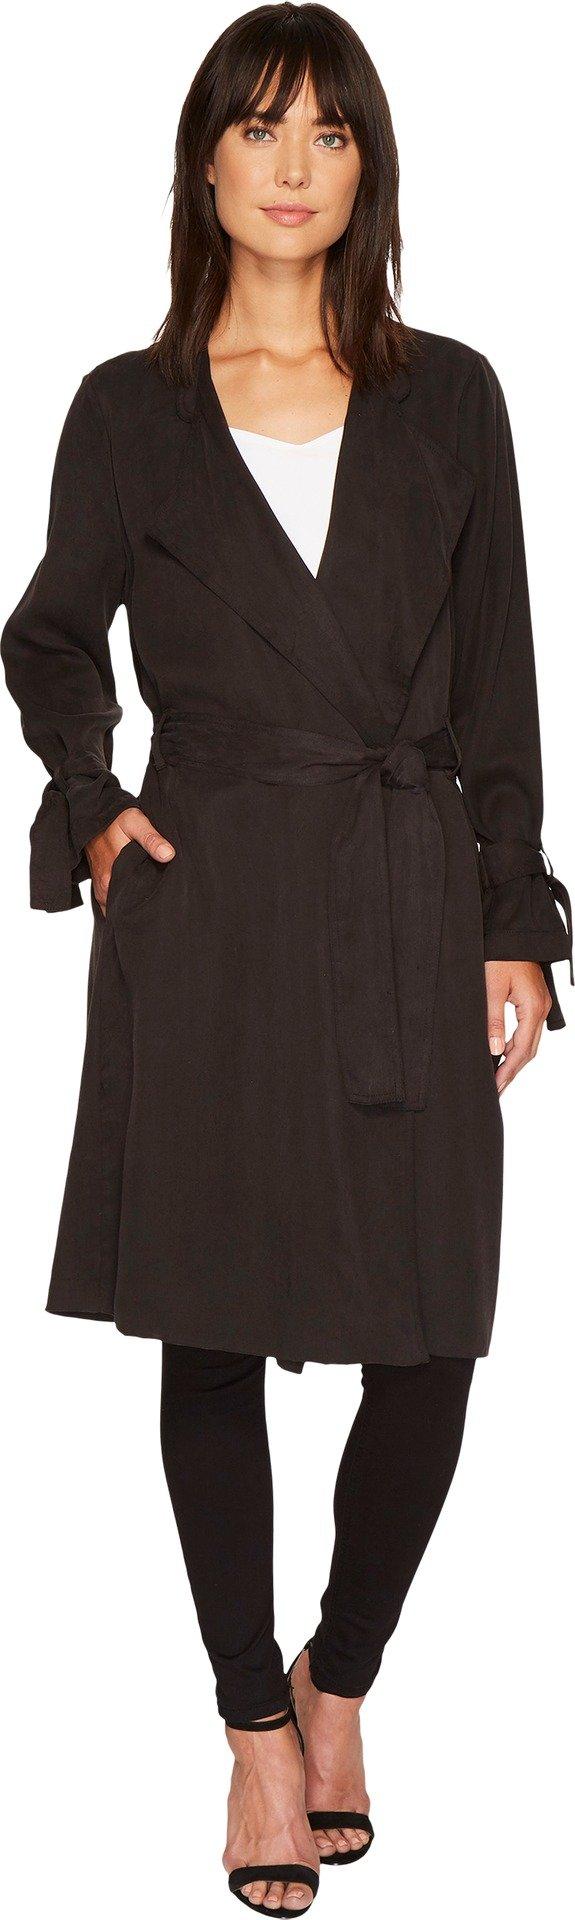 Splendid Women's Drape Trench Coat Black XS (Womens 0-2)